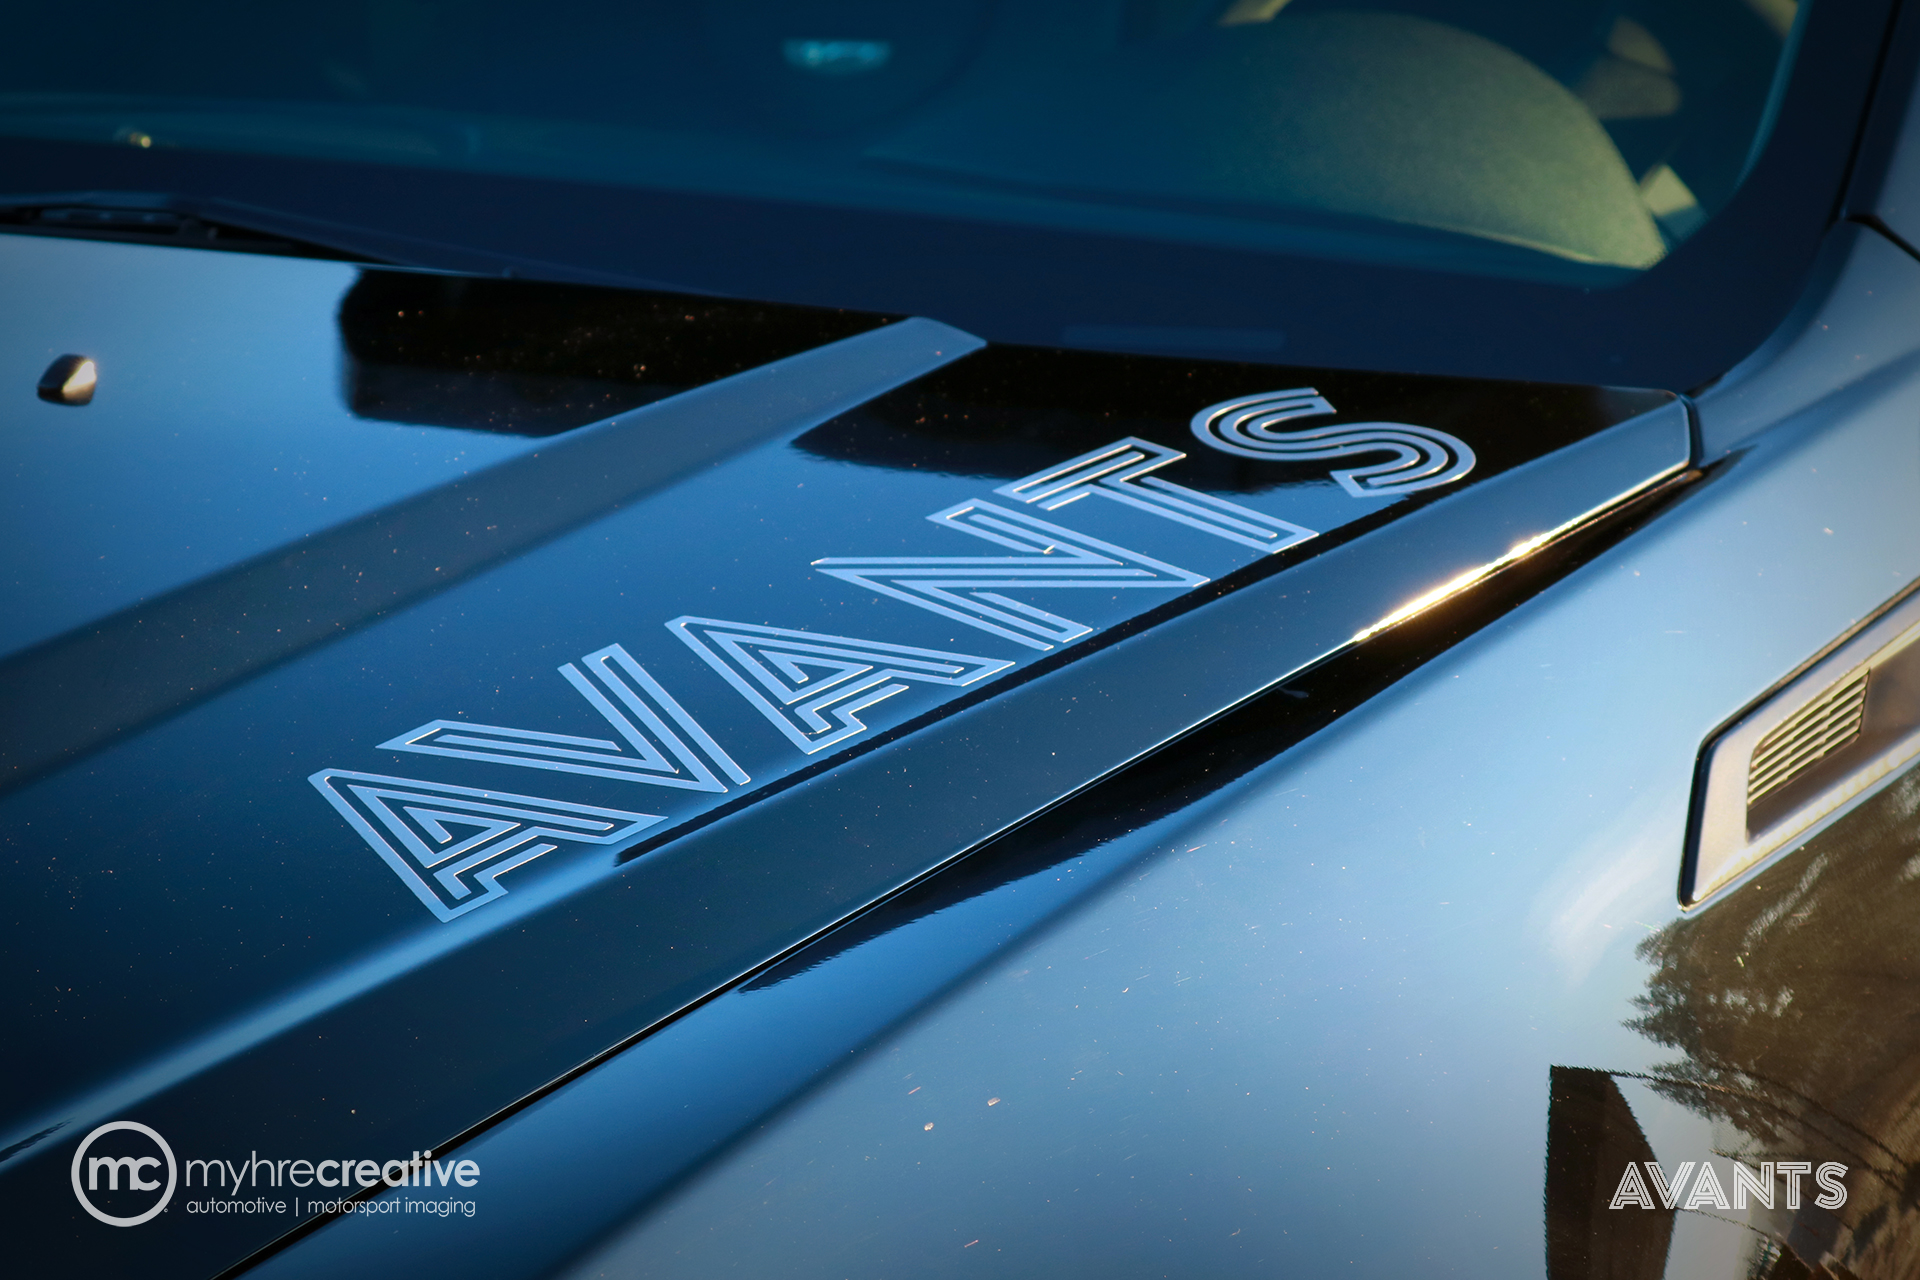 Logo_MyhreCreative_Avants_01.jpg